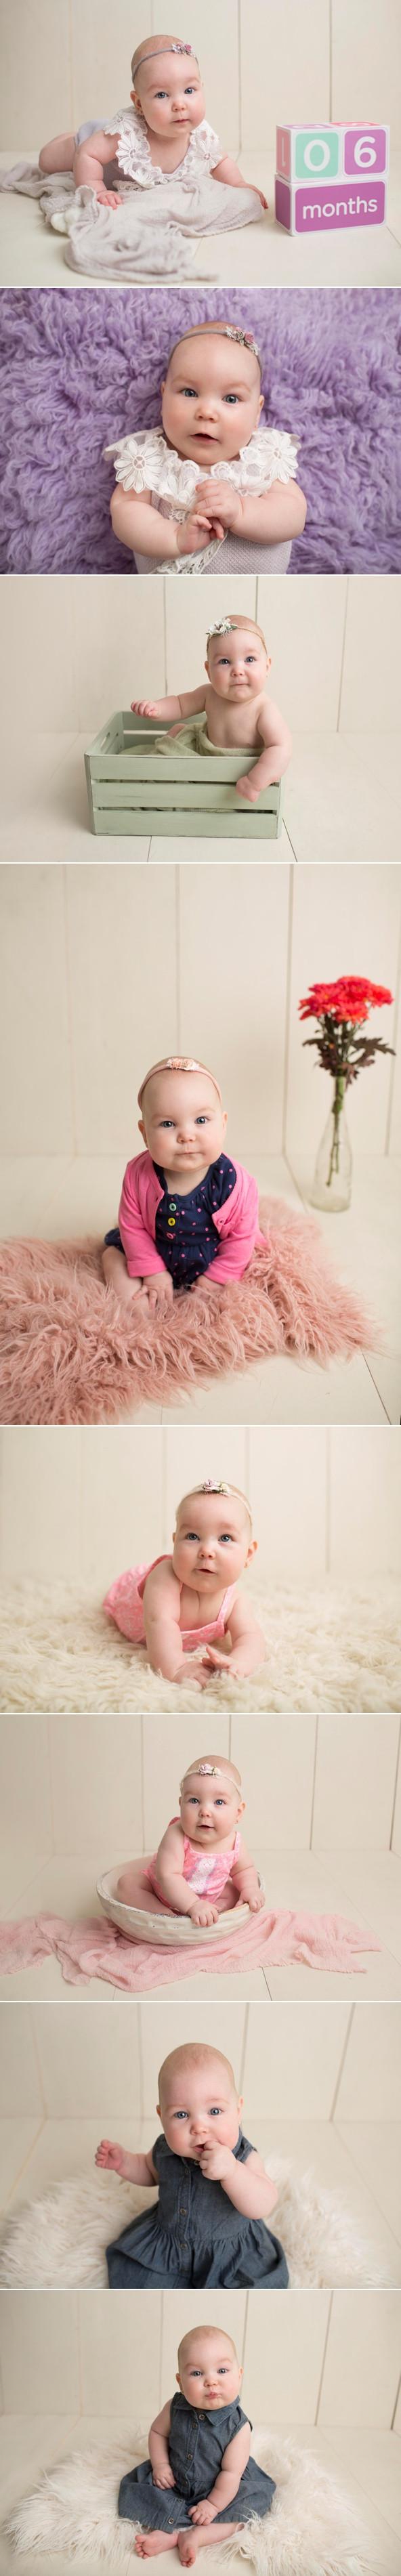 6 month old photos Regina